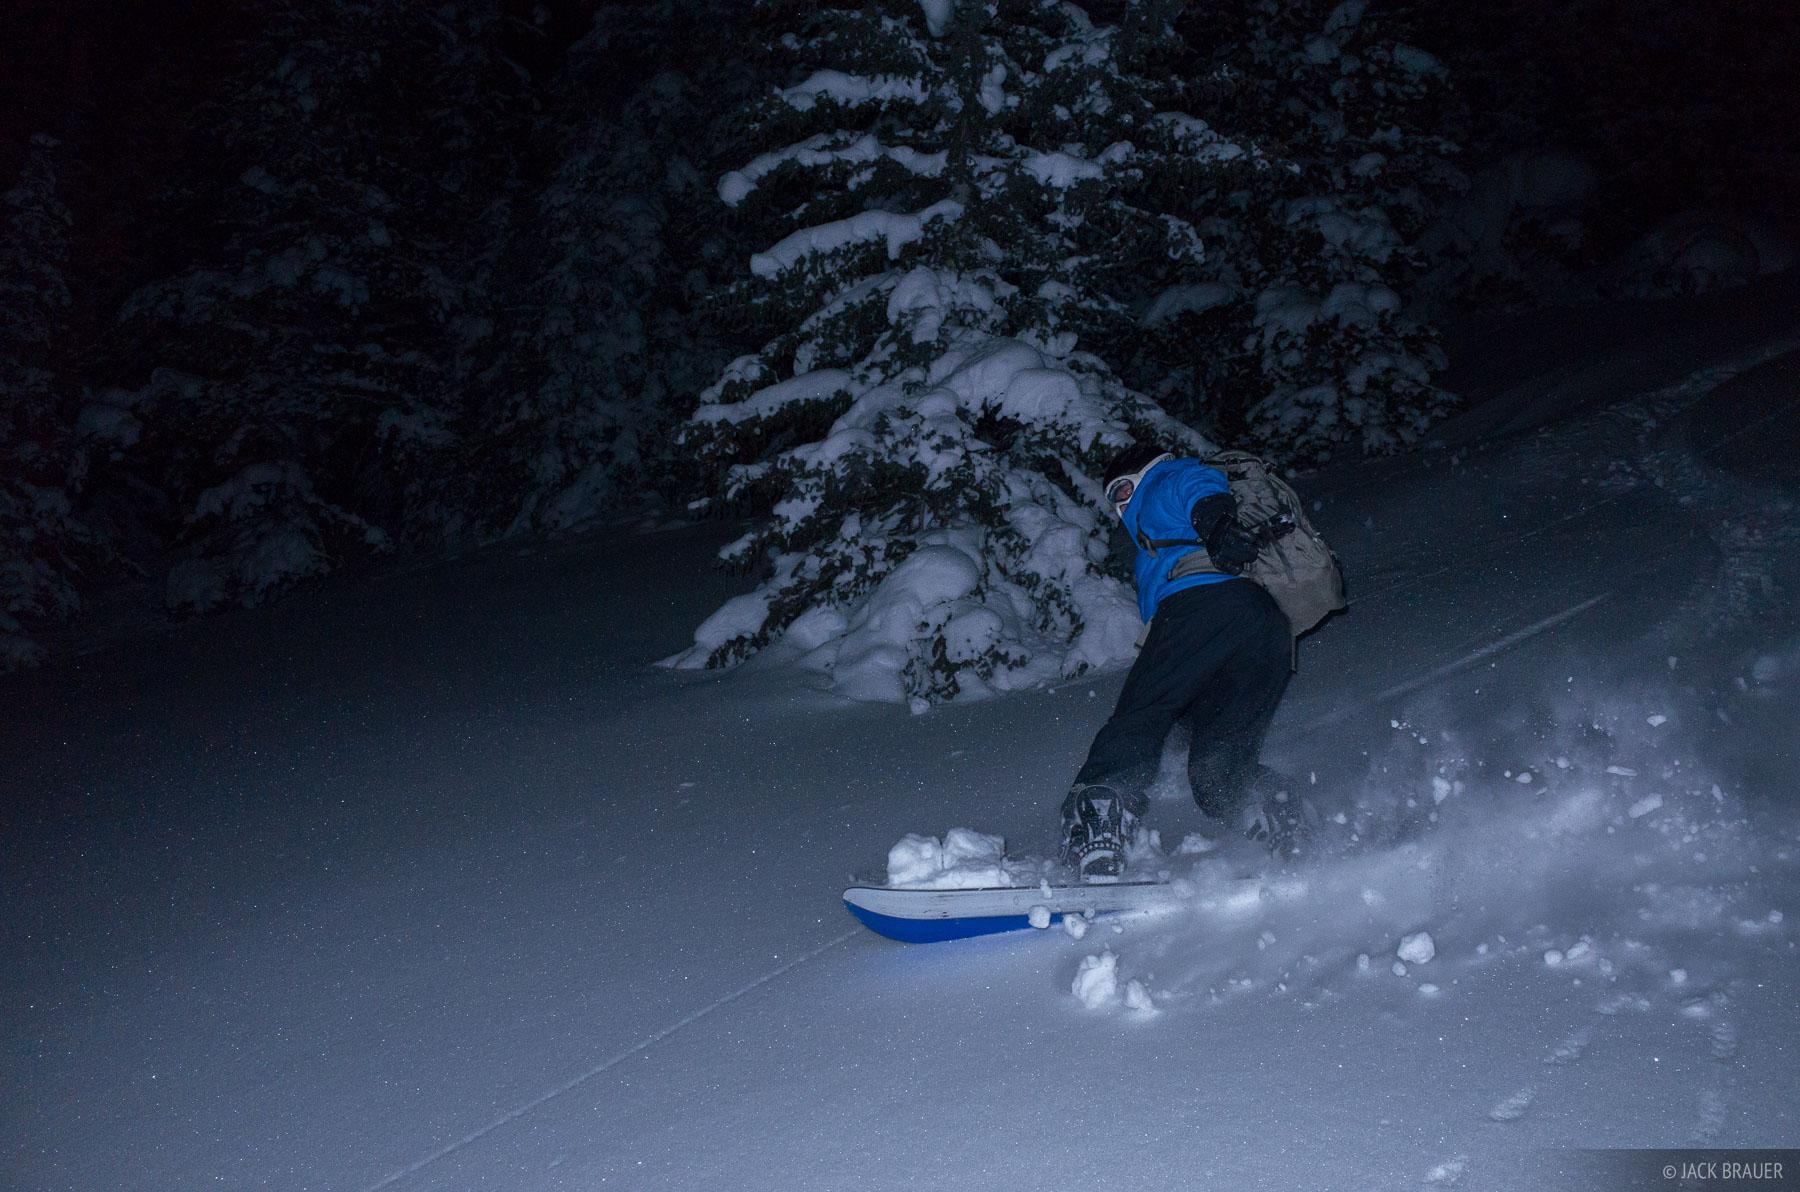 Colorado,Fowler Hilliard Hut,Gore Range, snowboarding, January, moonlight, photo